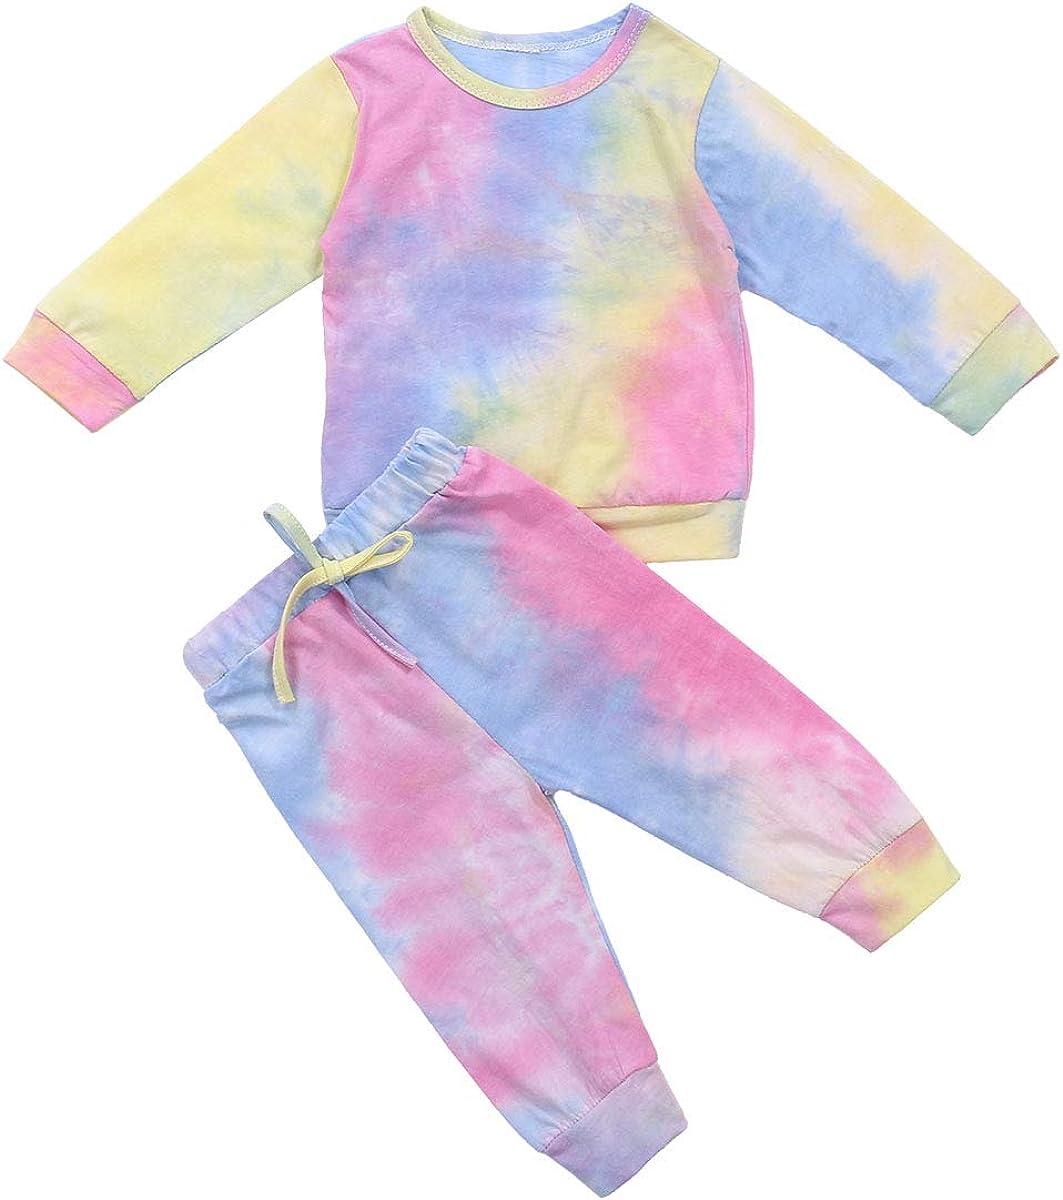 Meipitgy 2Pcs Toddler Baby Girls Boys Long Sleeve Tie Dye Pajamas Set Sleepwear Nightwear Lounge Clothes